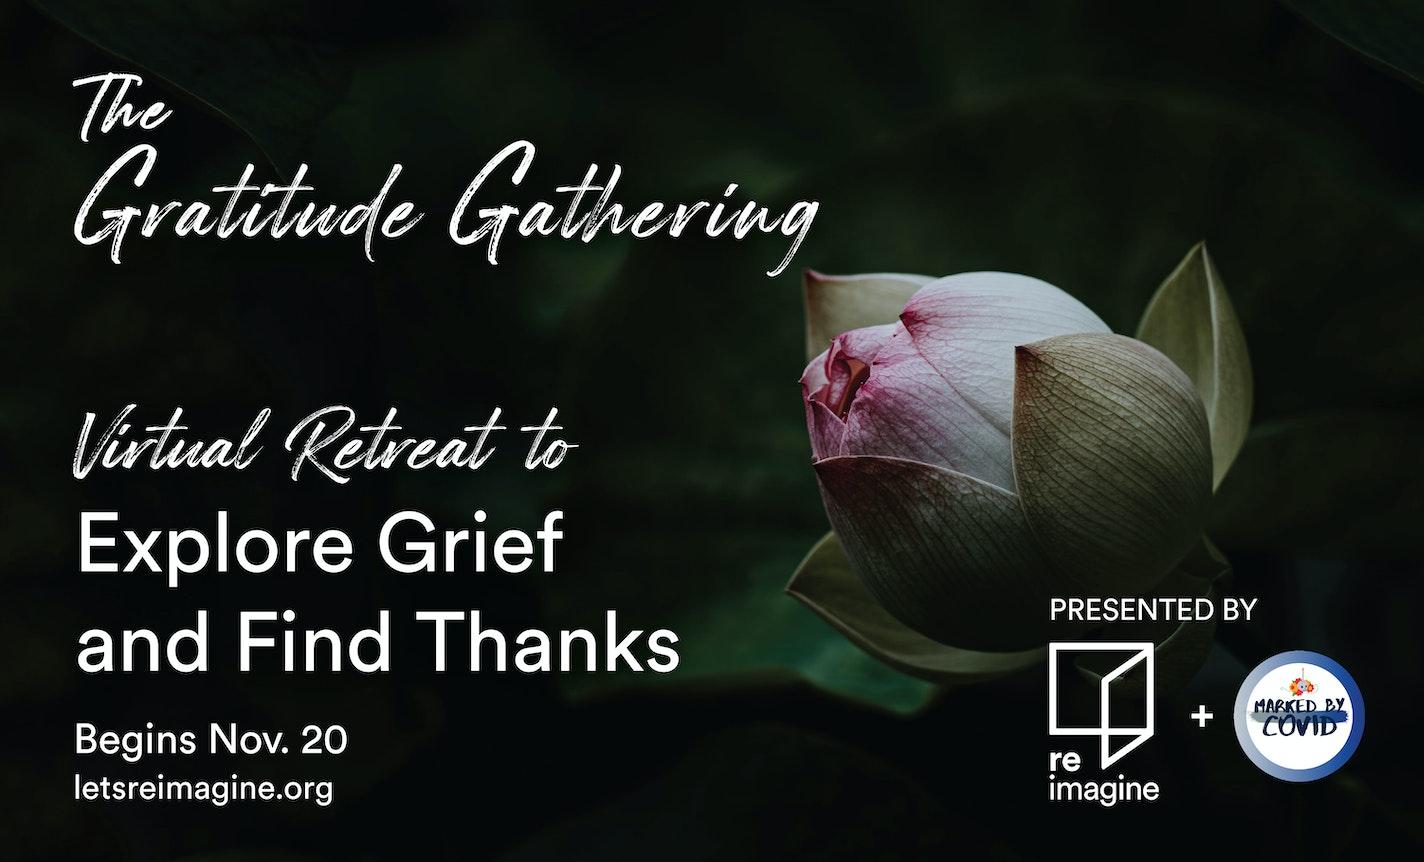 The Gratitude Gathering: THANKSGIVING